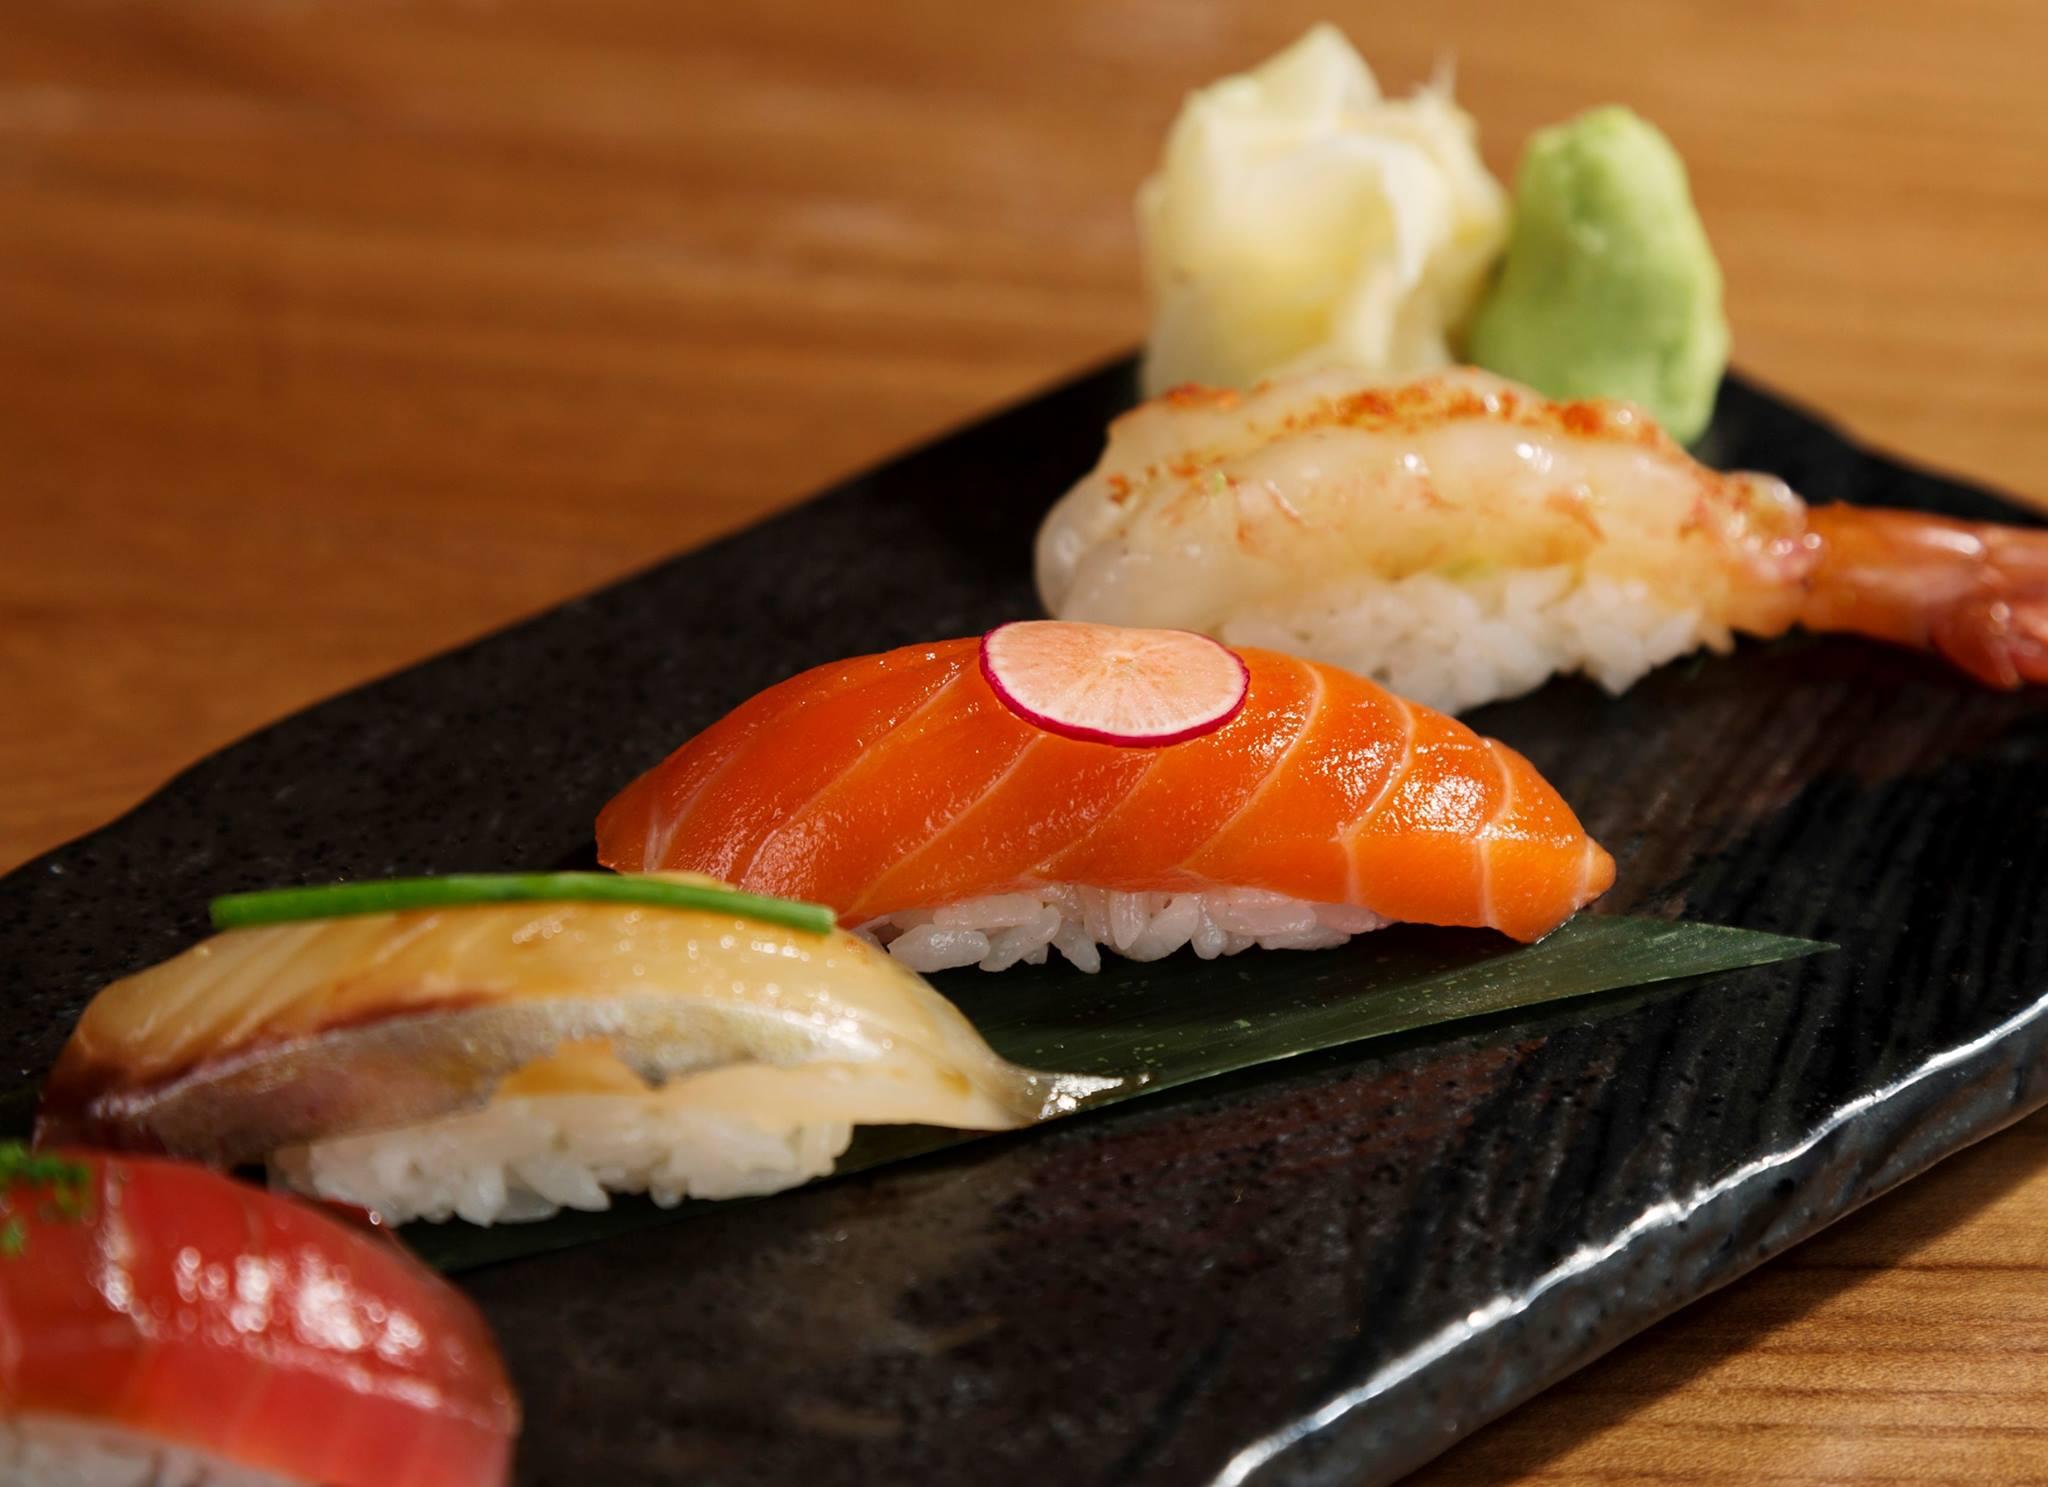 Salmon, shrimp, and more fruits of the sea await at Roka Akor